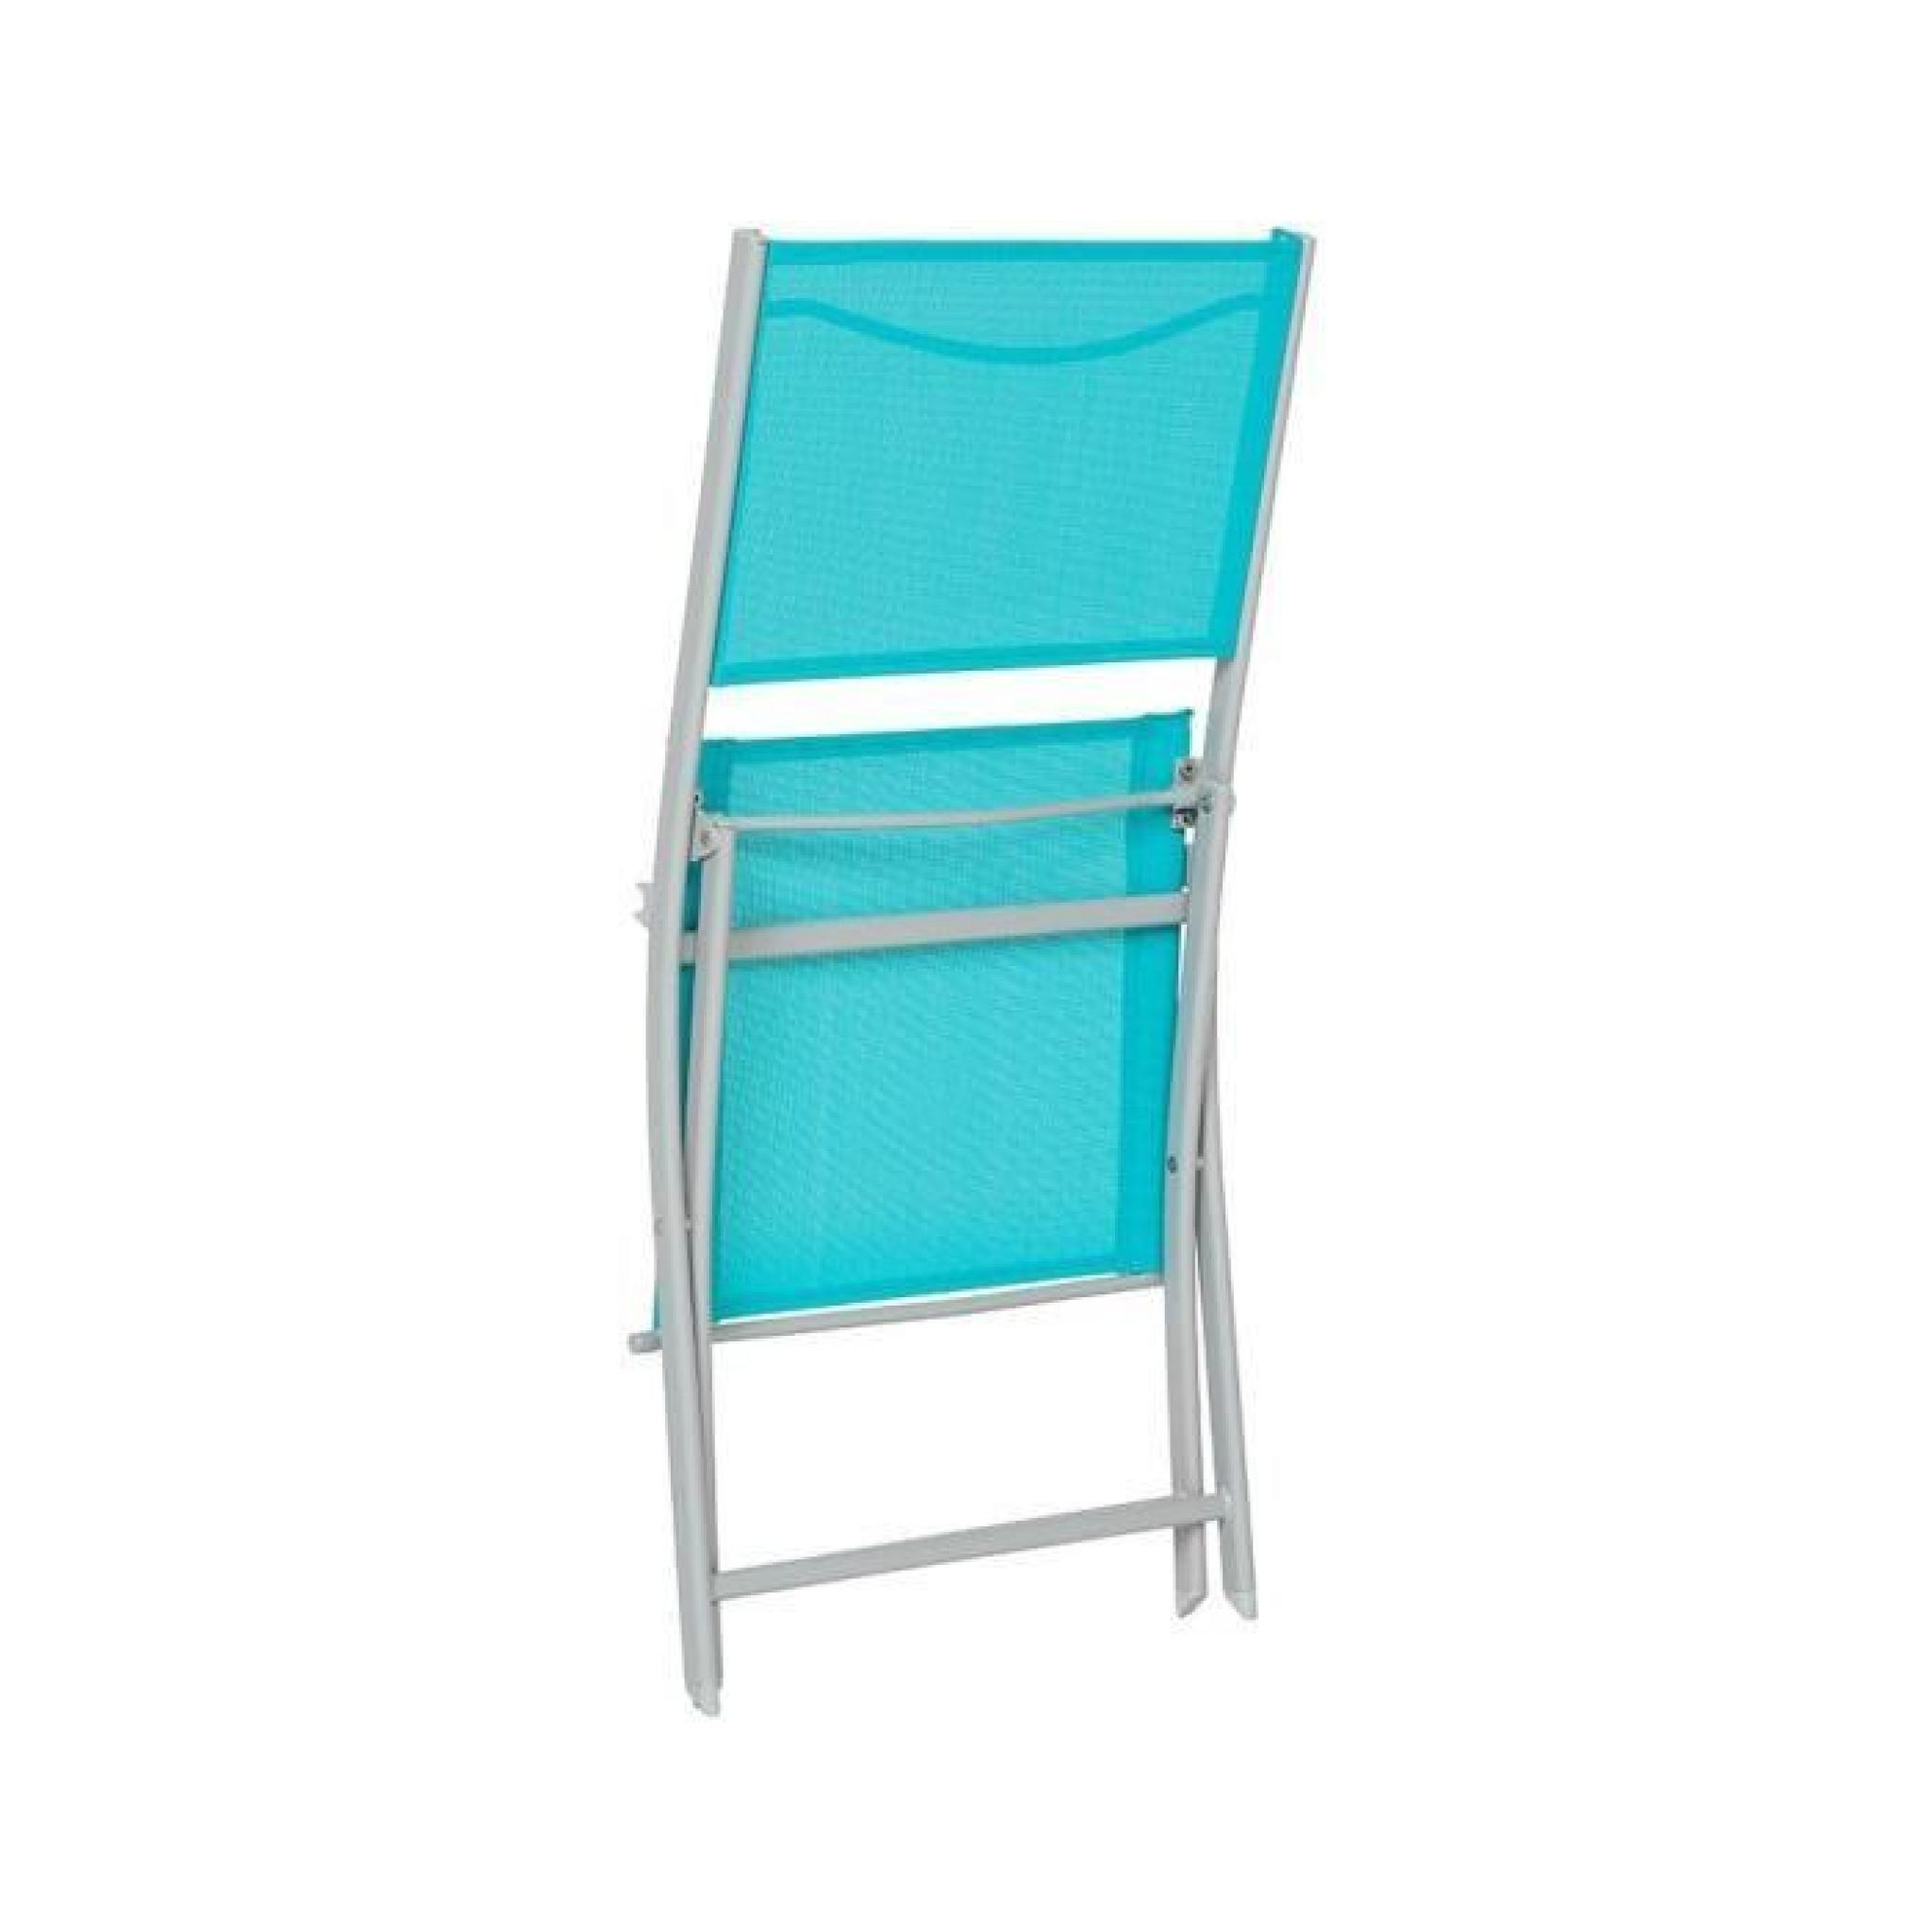 Chaise Pliante Hespéride Modula Bleu Lagon/silver Mat avec Chaise De Jardin Hesperide